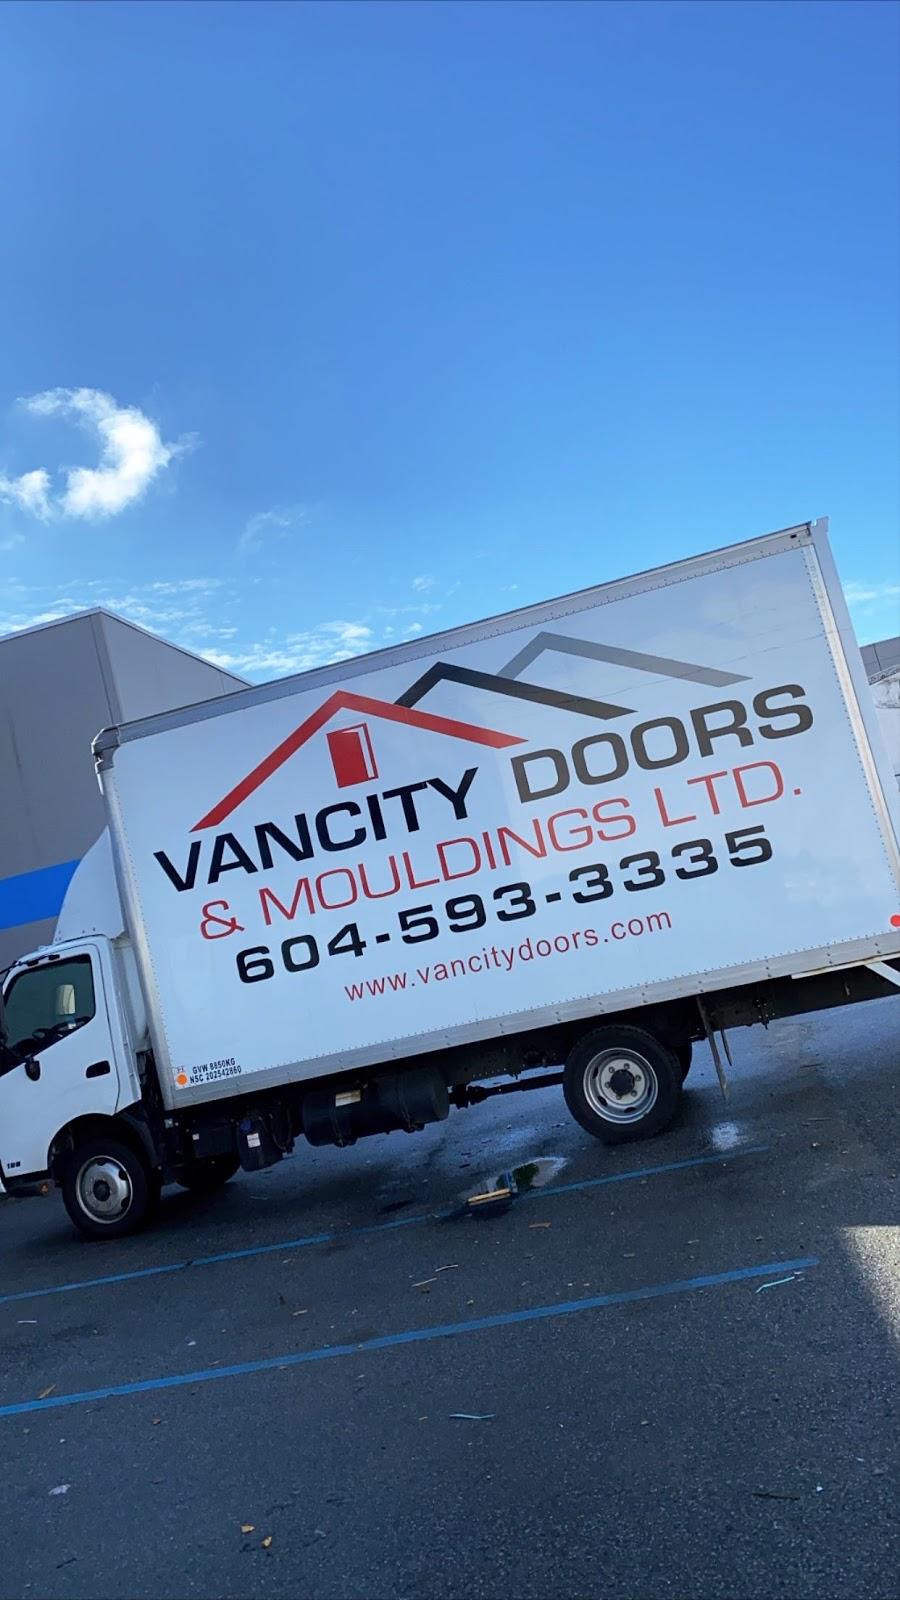 Vancity Doors & Mouldings Ltd.